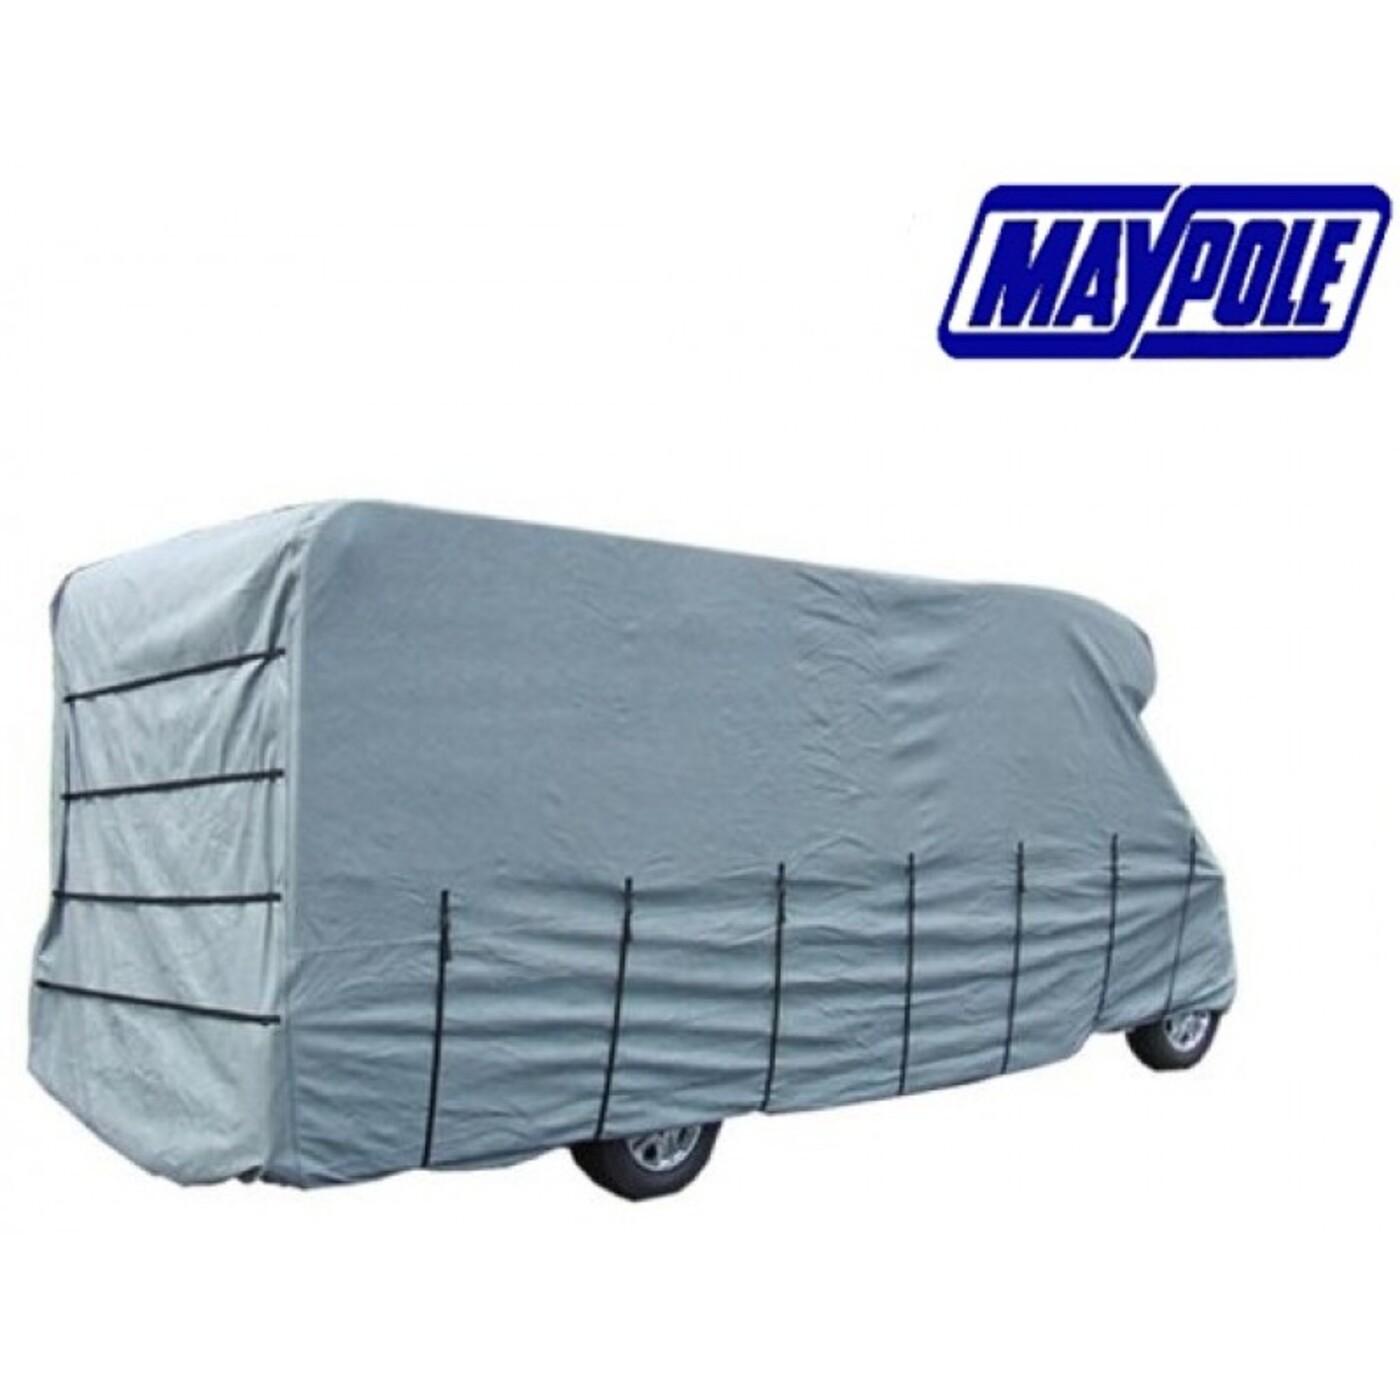 Maypole Motorhome Covers Grey Homestead Caravans